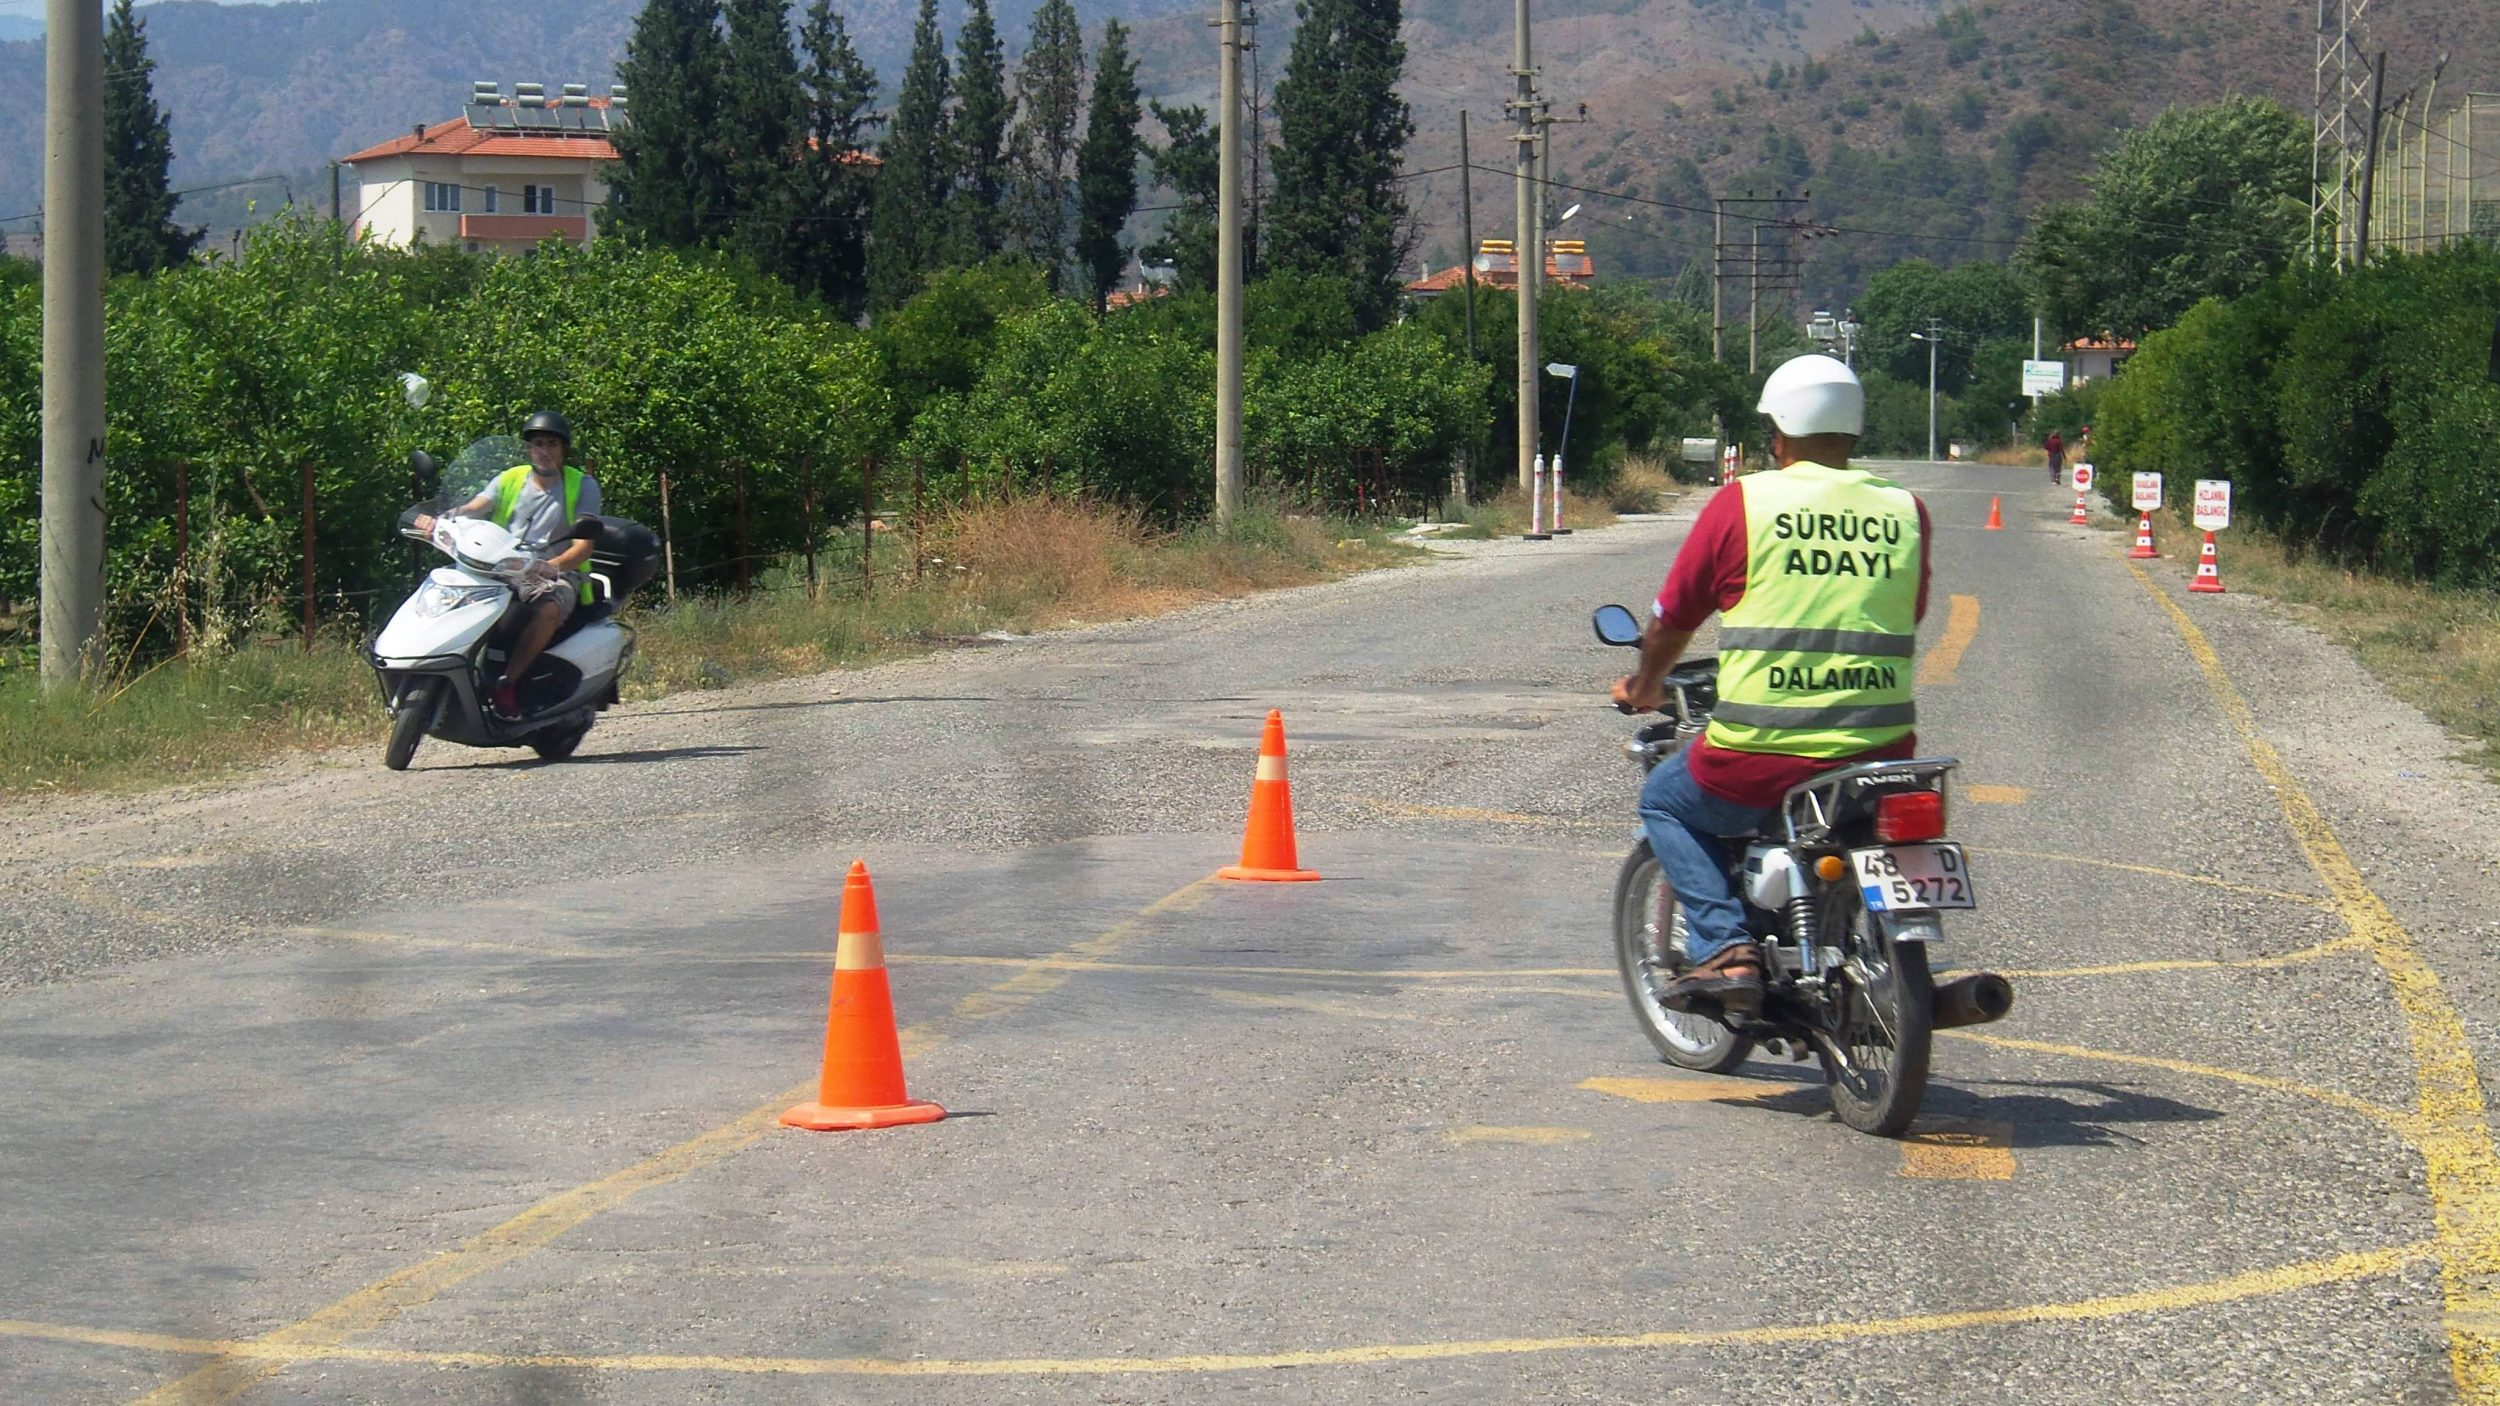 DALAMAN DA MOTORSİKLET EHLİYETİ UYGULAMA SINAVI